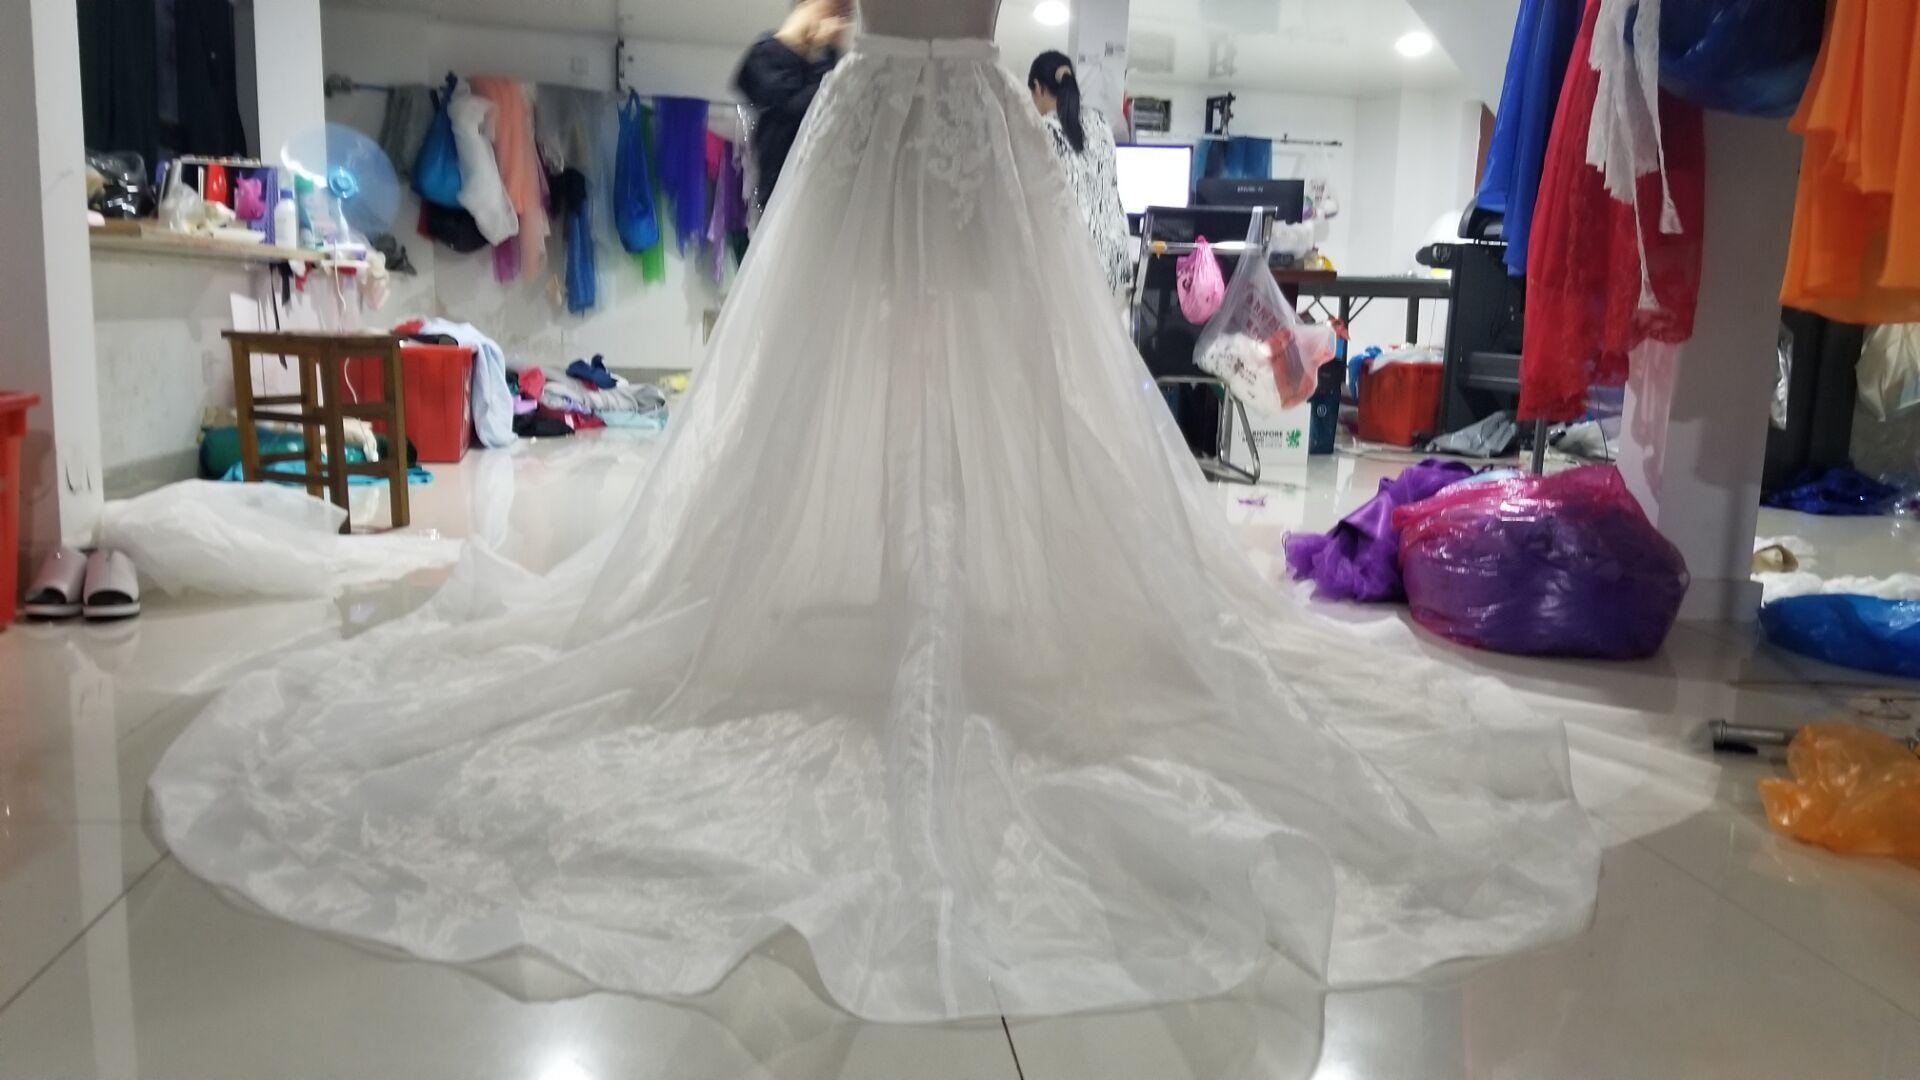 Organza Removable Skirt Detachable Train Wedding Train Appliqued Train Detachable Tulle Dress